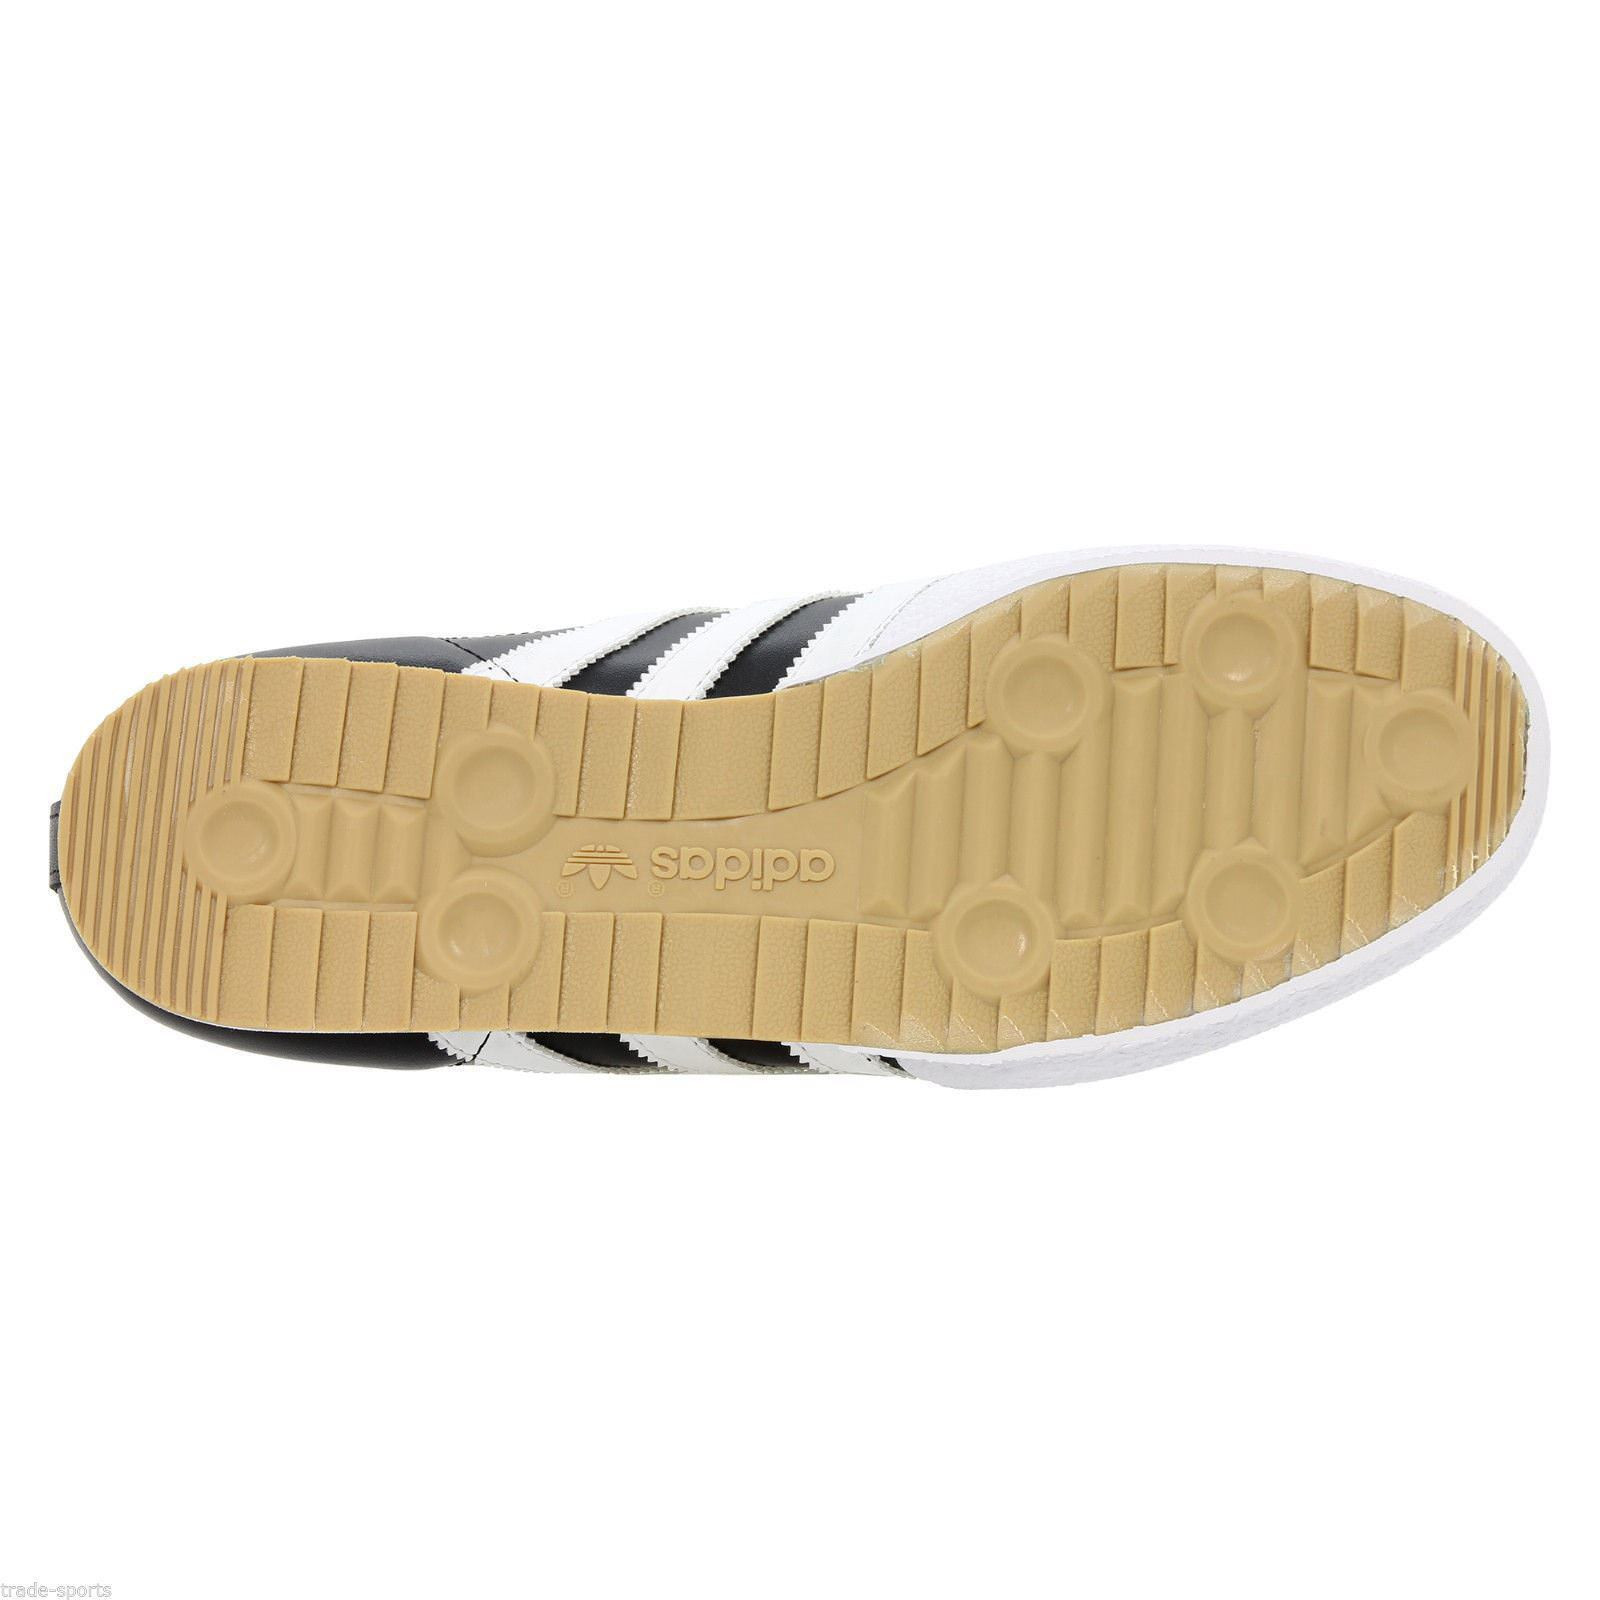 Adidas ORIGINALS SAMBA SUPER RETRO TRAINERS MEN'S SNEAKERS Schuhe RETRO SUPER FOOTBALL 76a07e